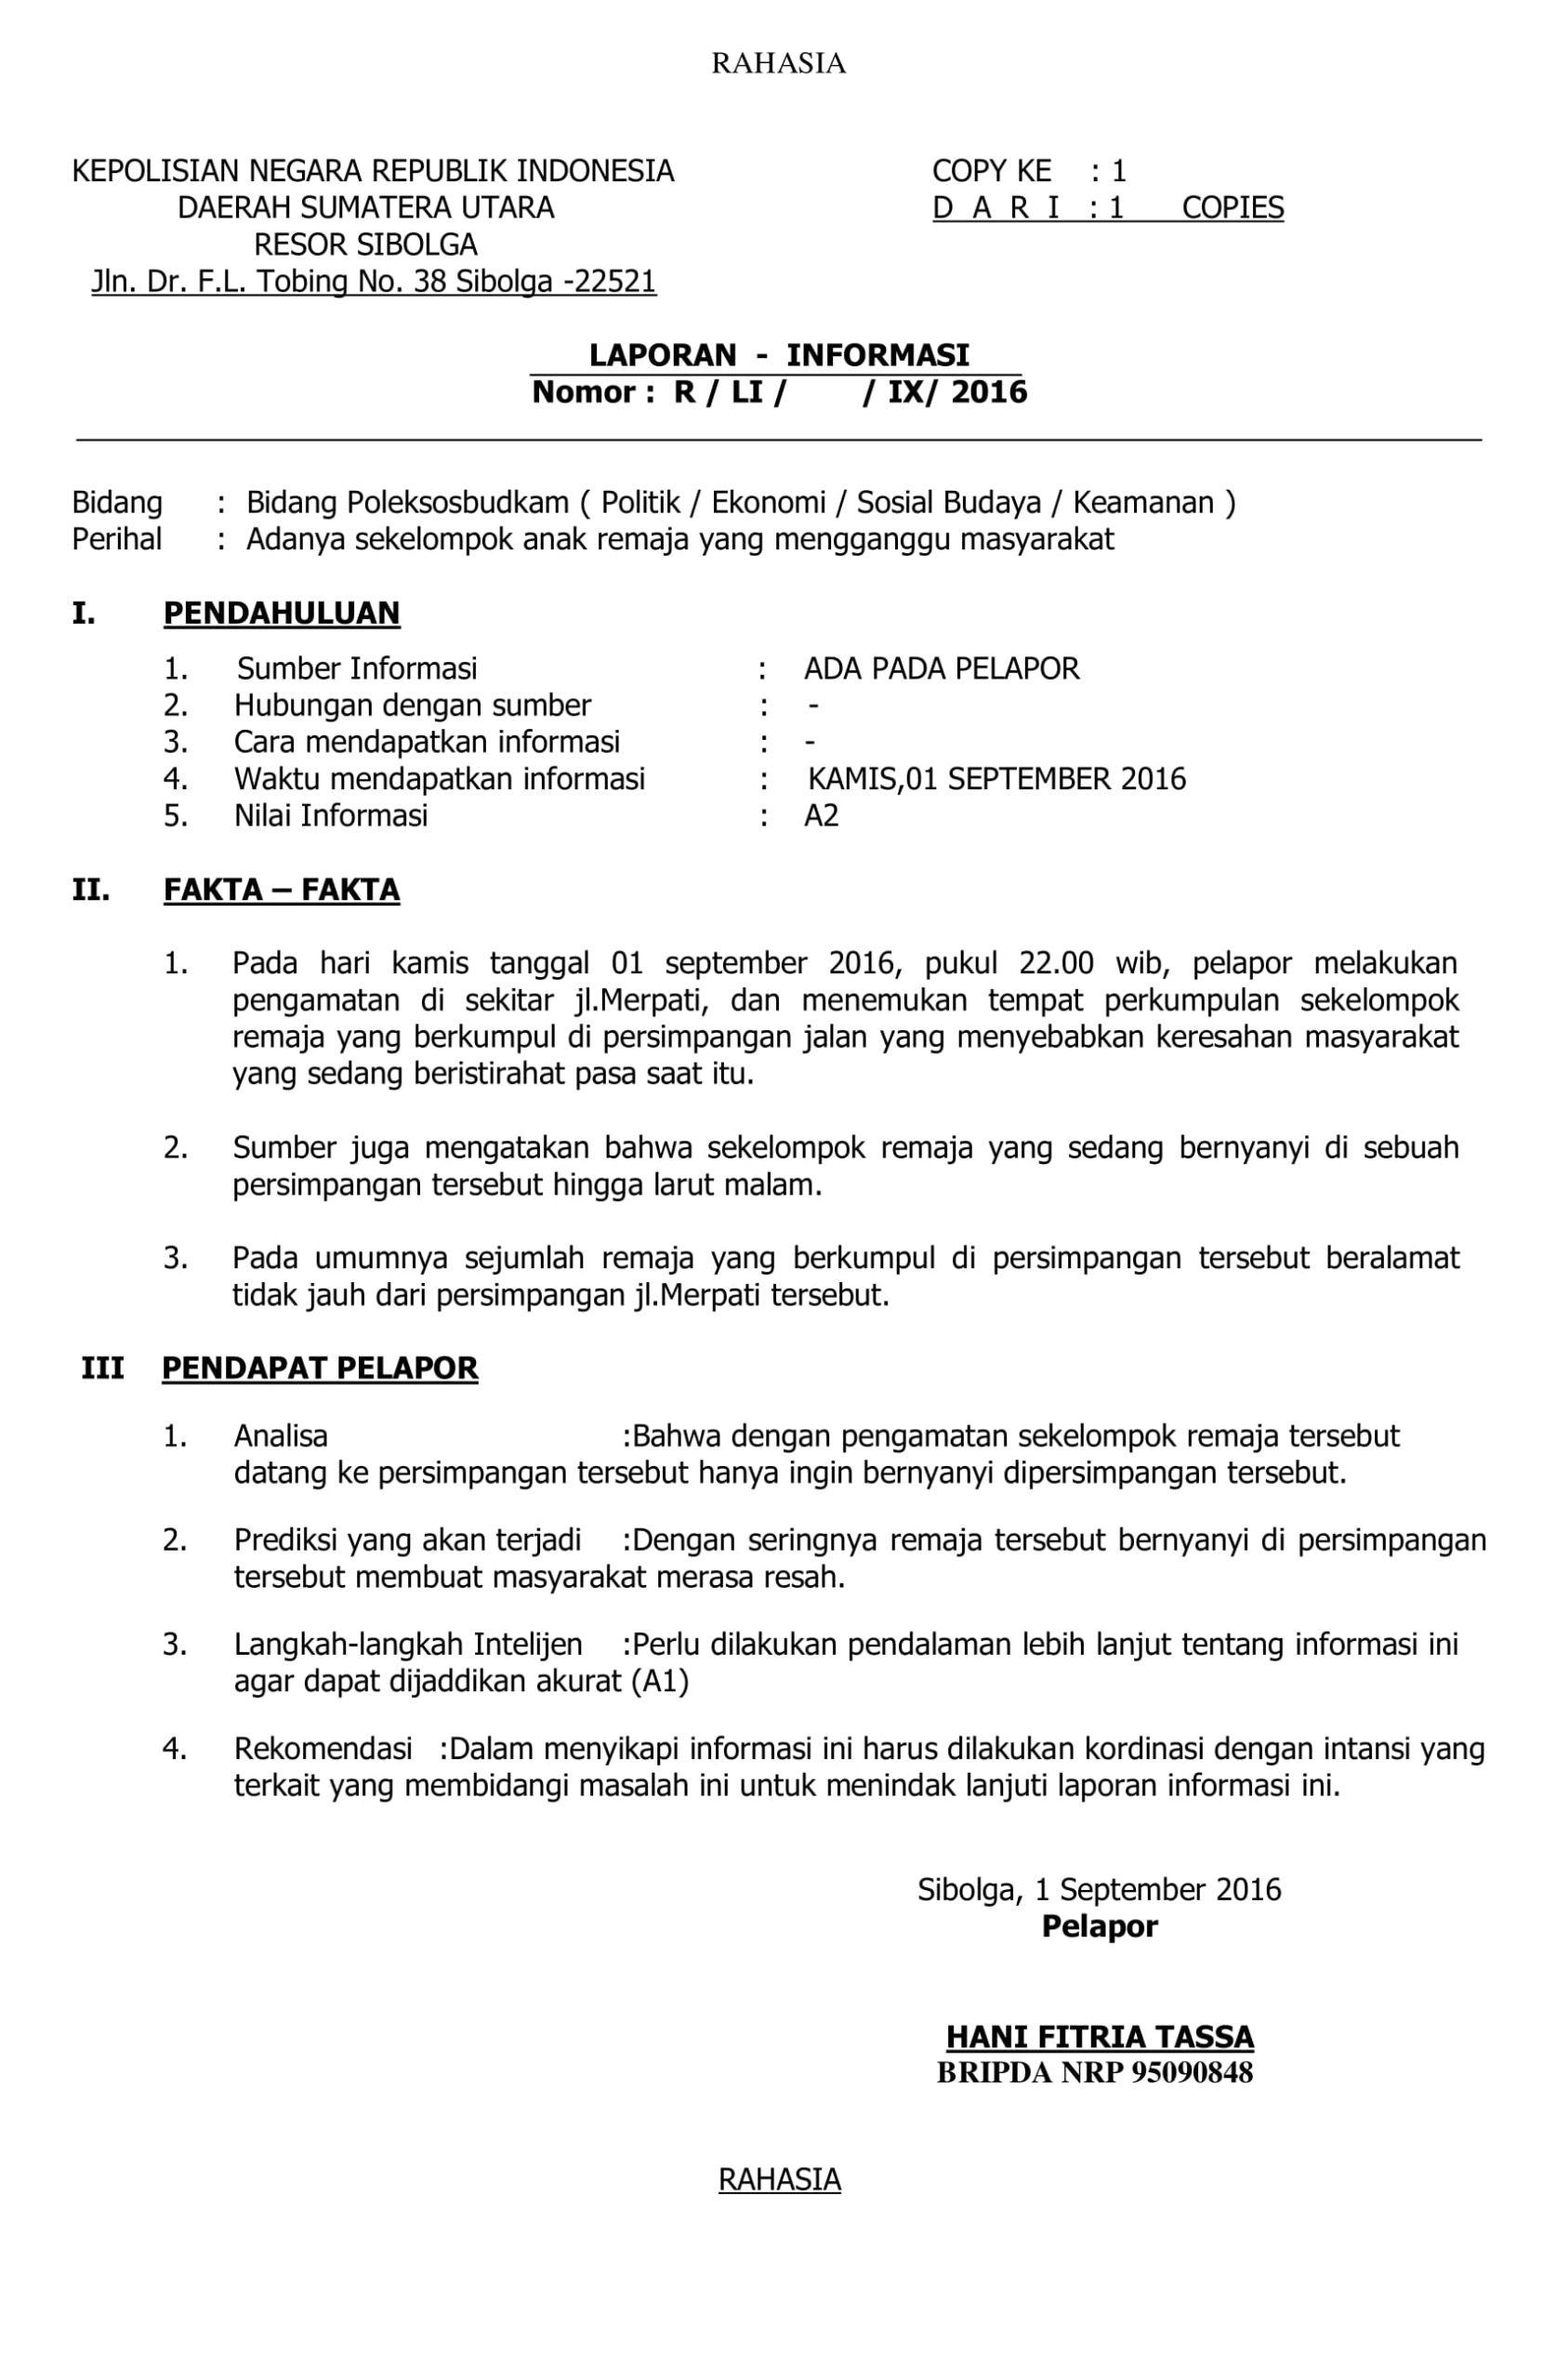 Laporan Informasi Pengertian Tujuan Contoh Docx